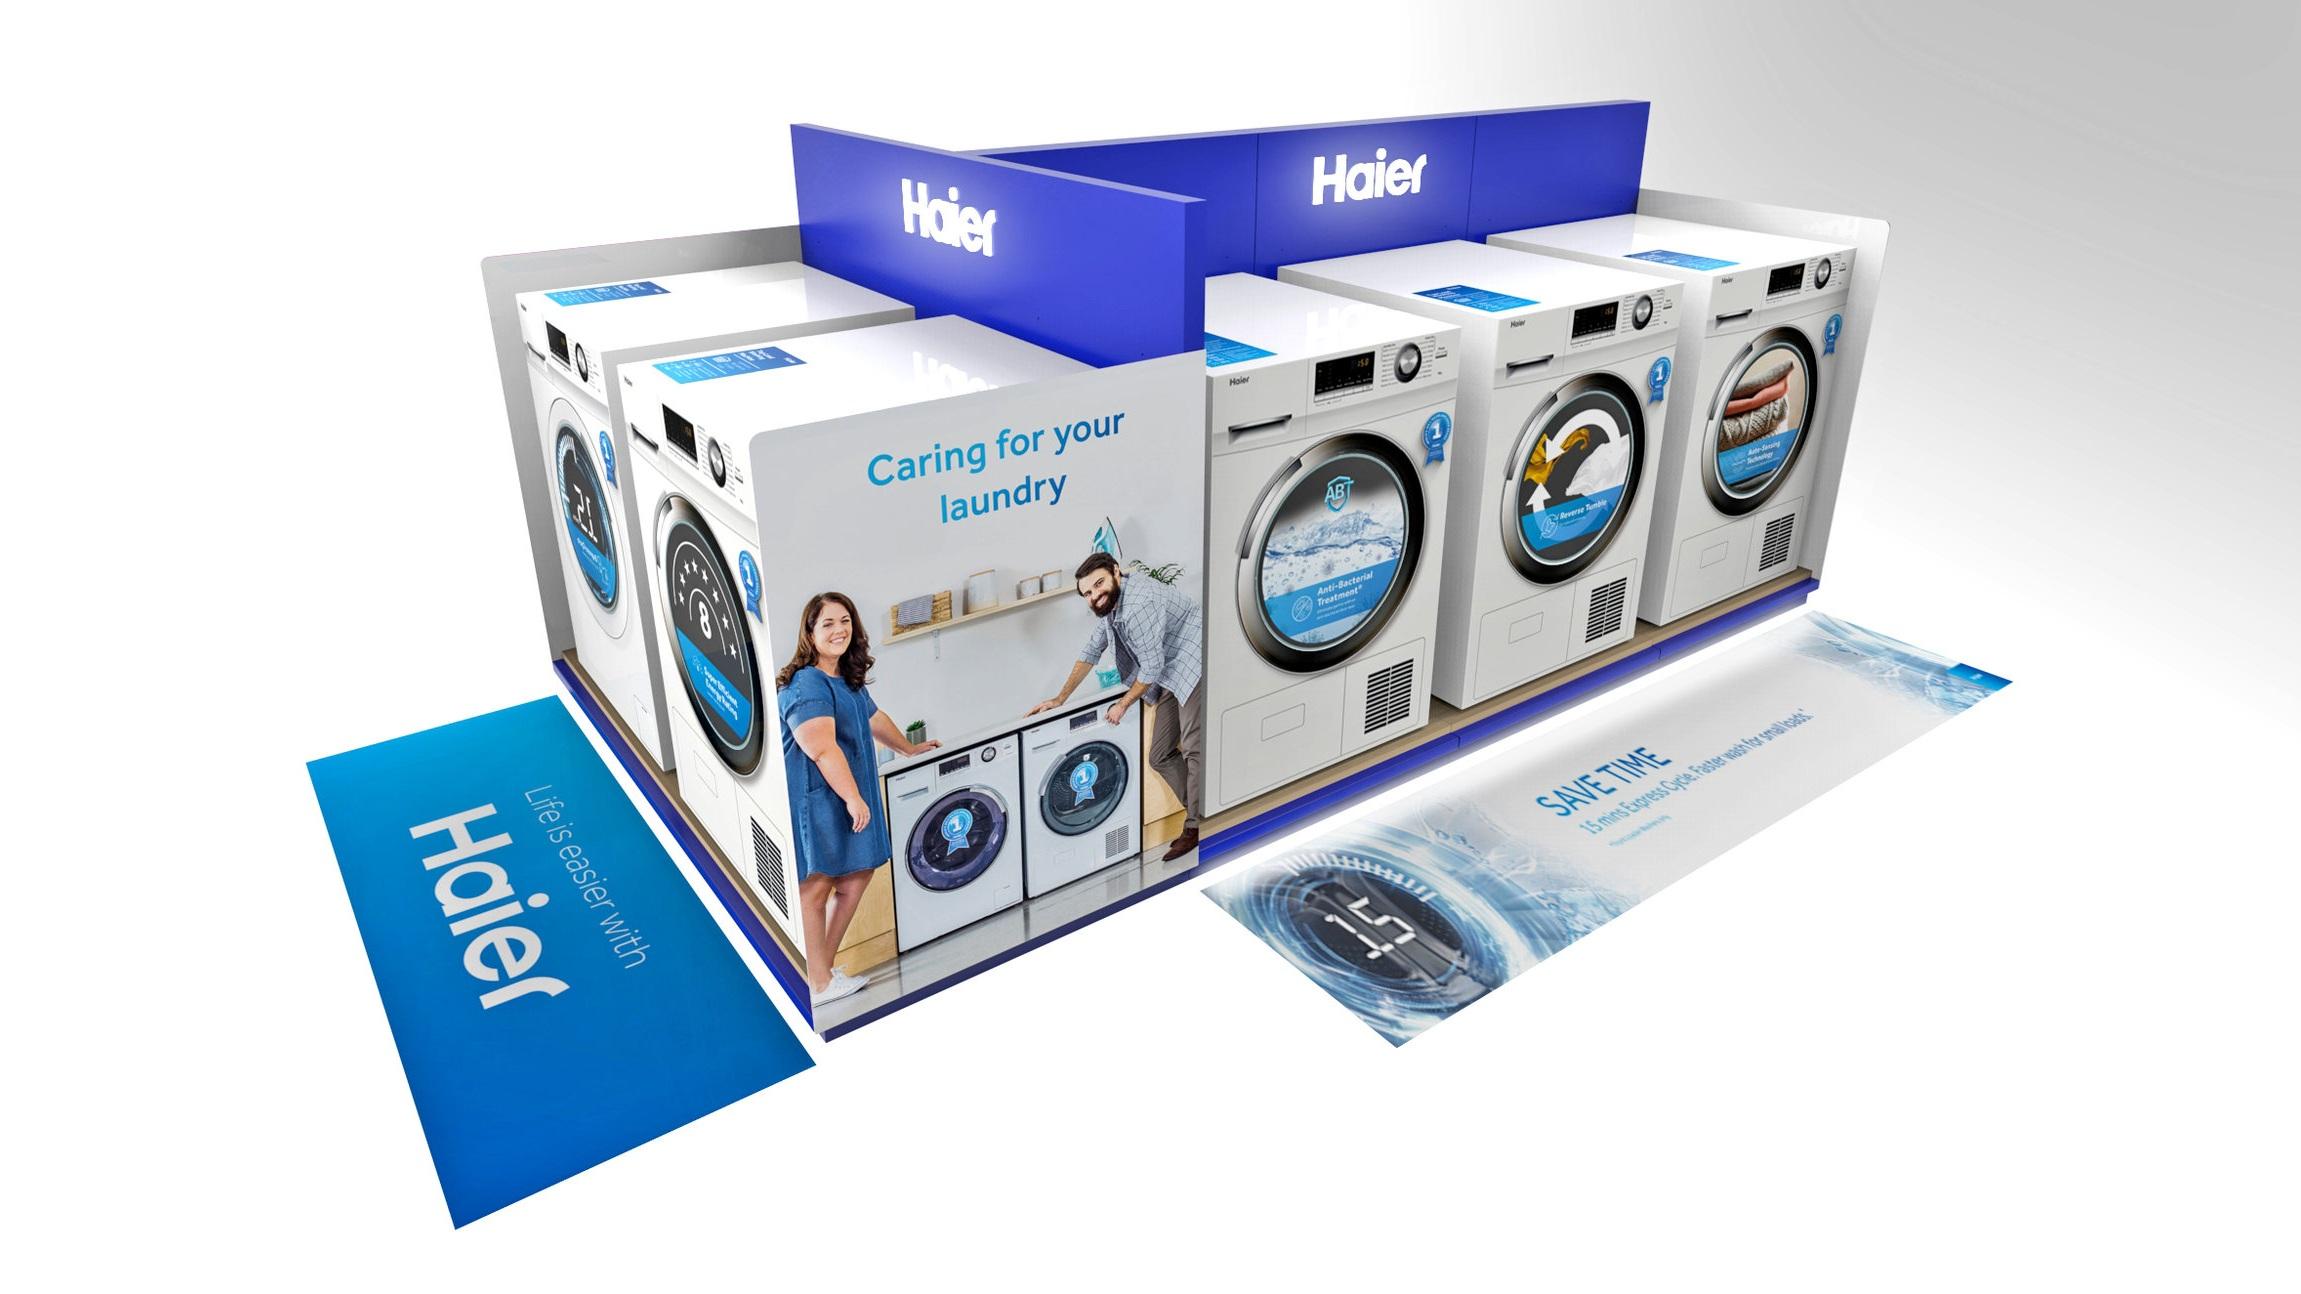 HAI006_laundry+Final+Design_01111.31.jpg